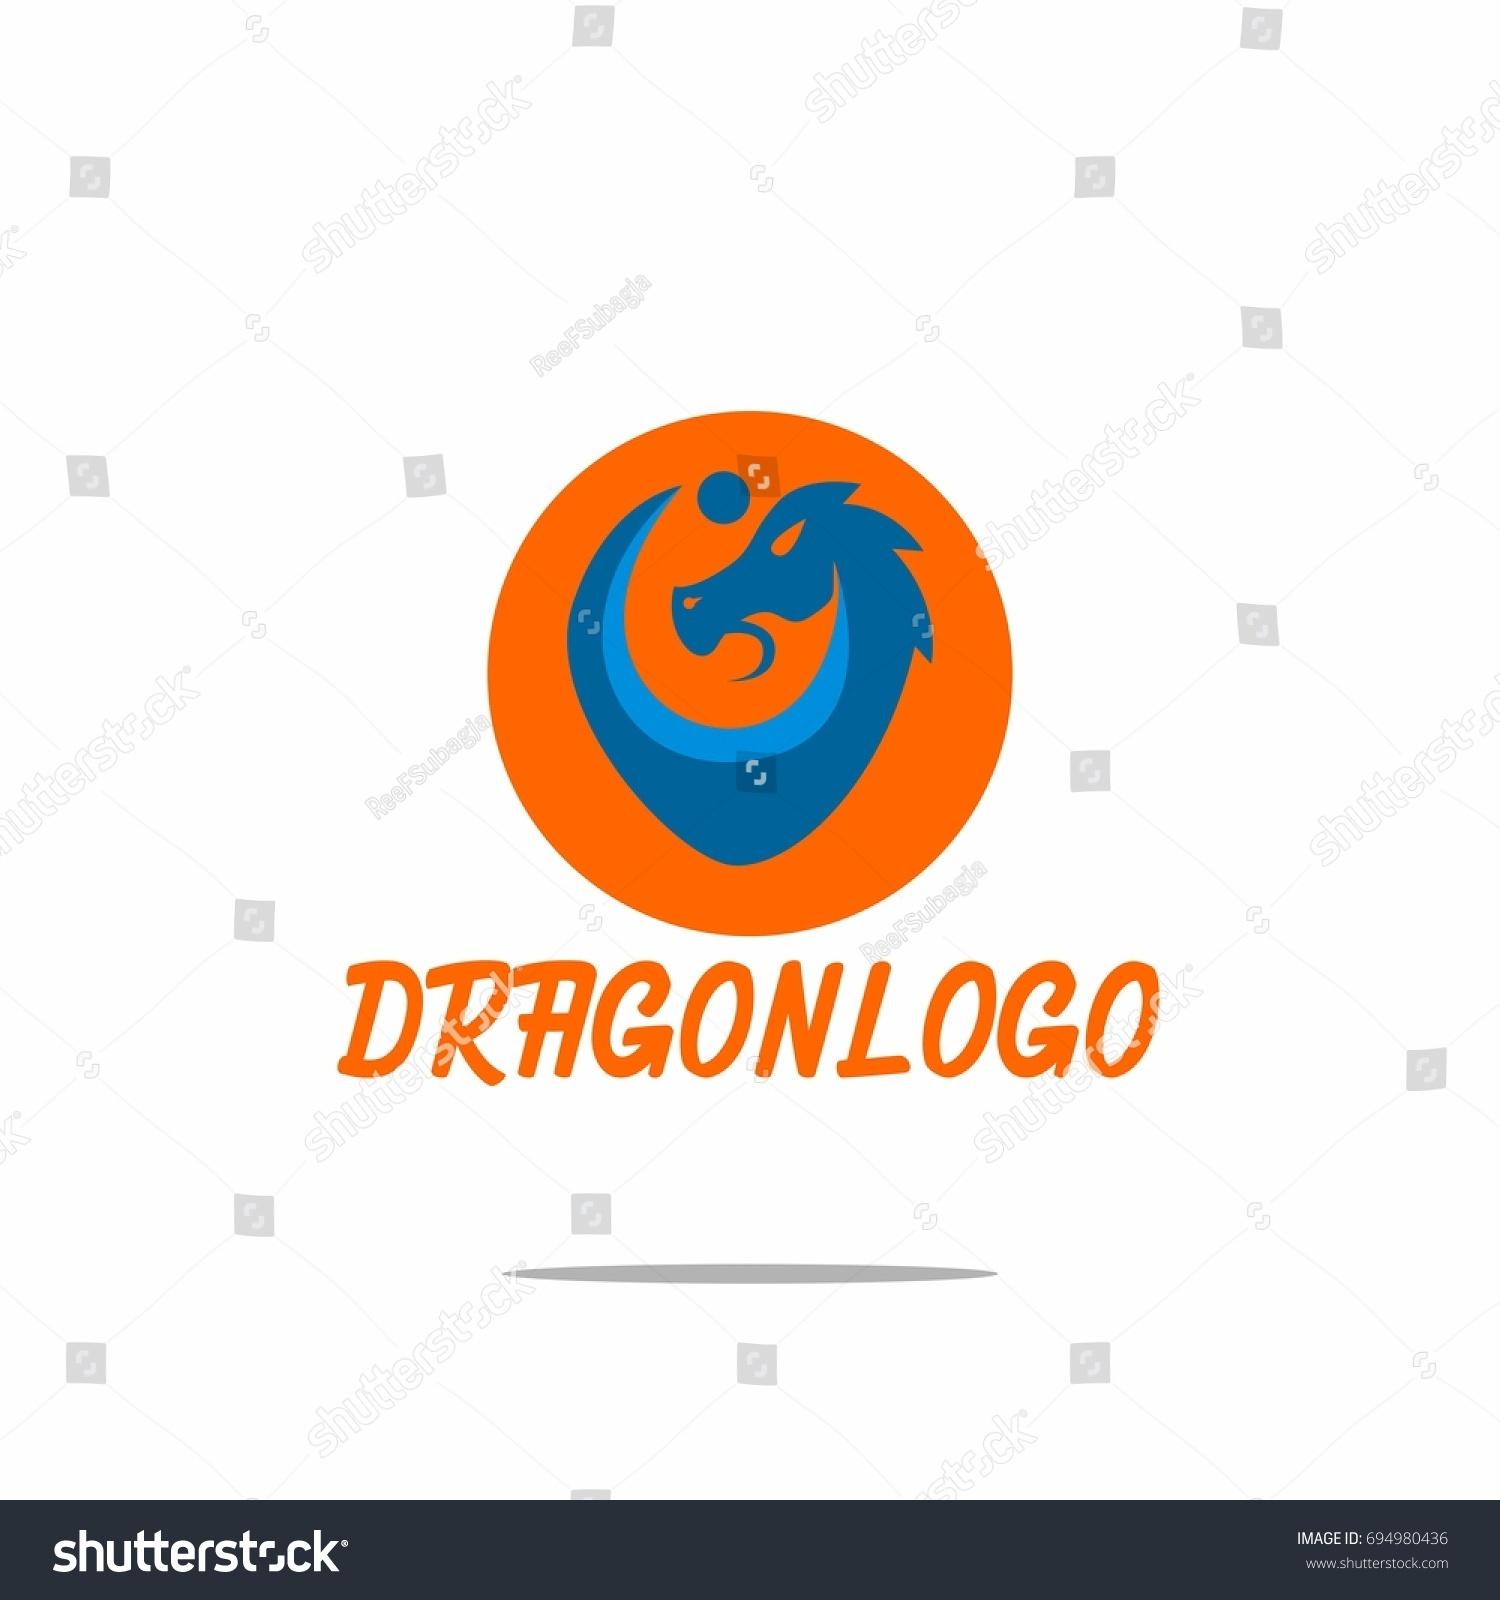 cool dragon logo design